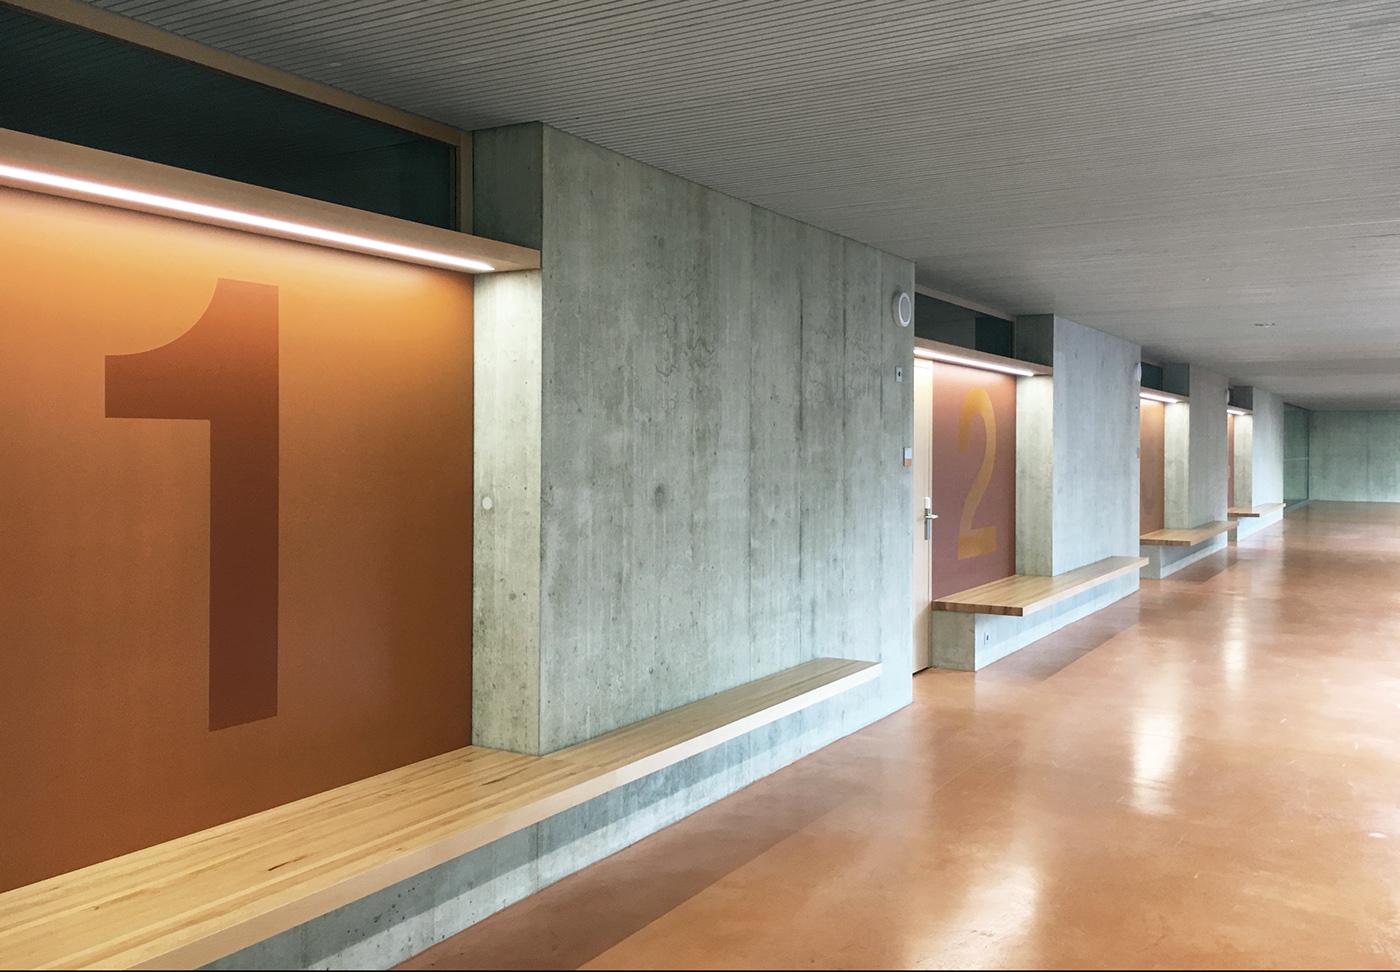 Massagno小学体育馆环境图形设计©Central studio